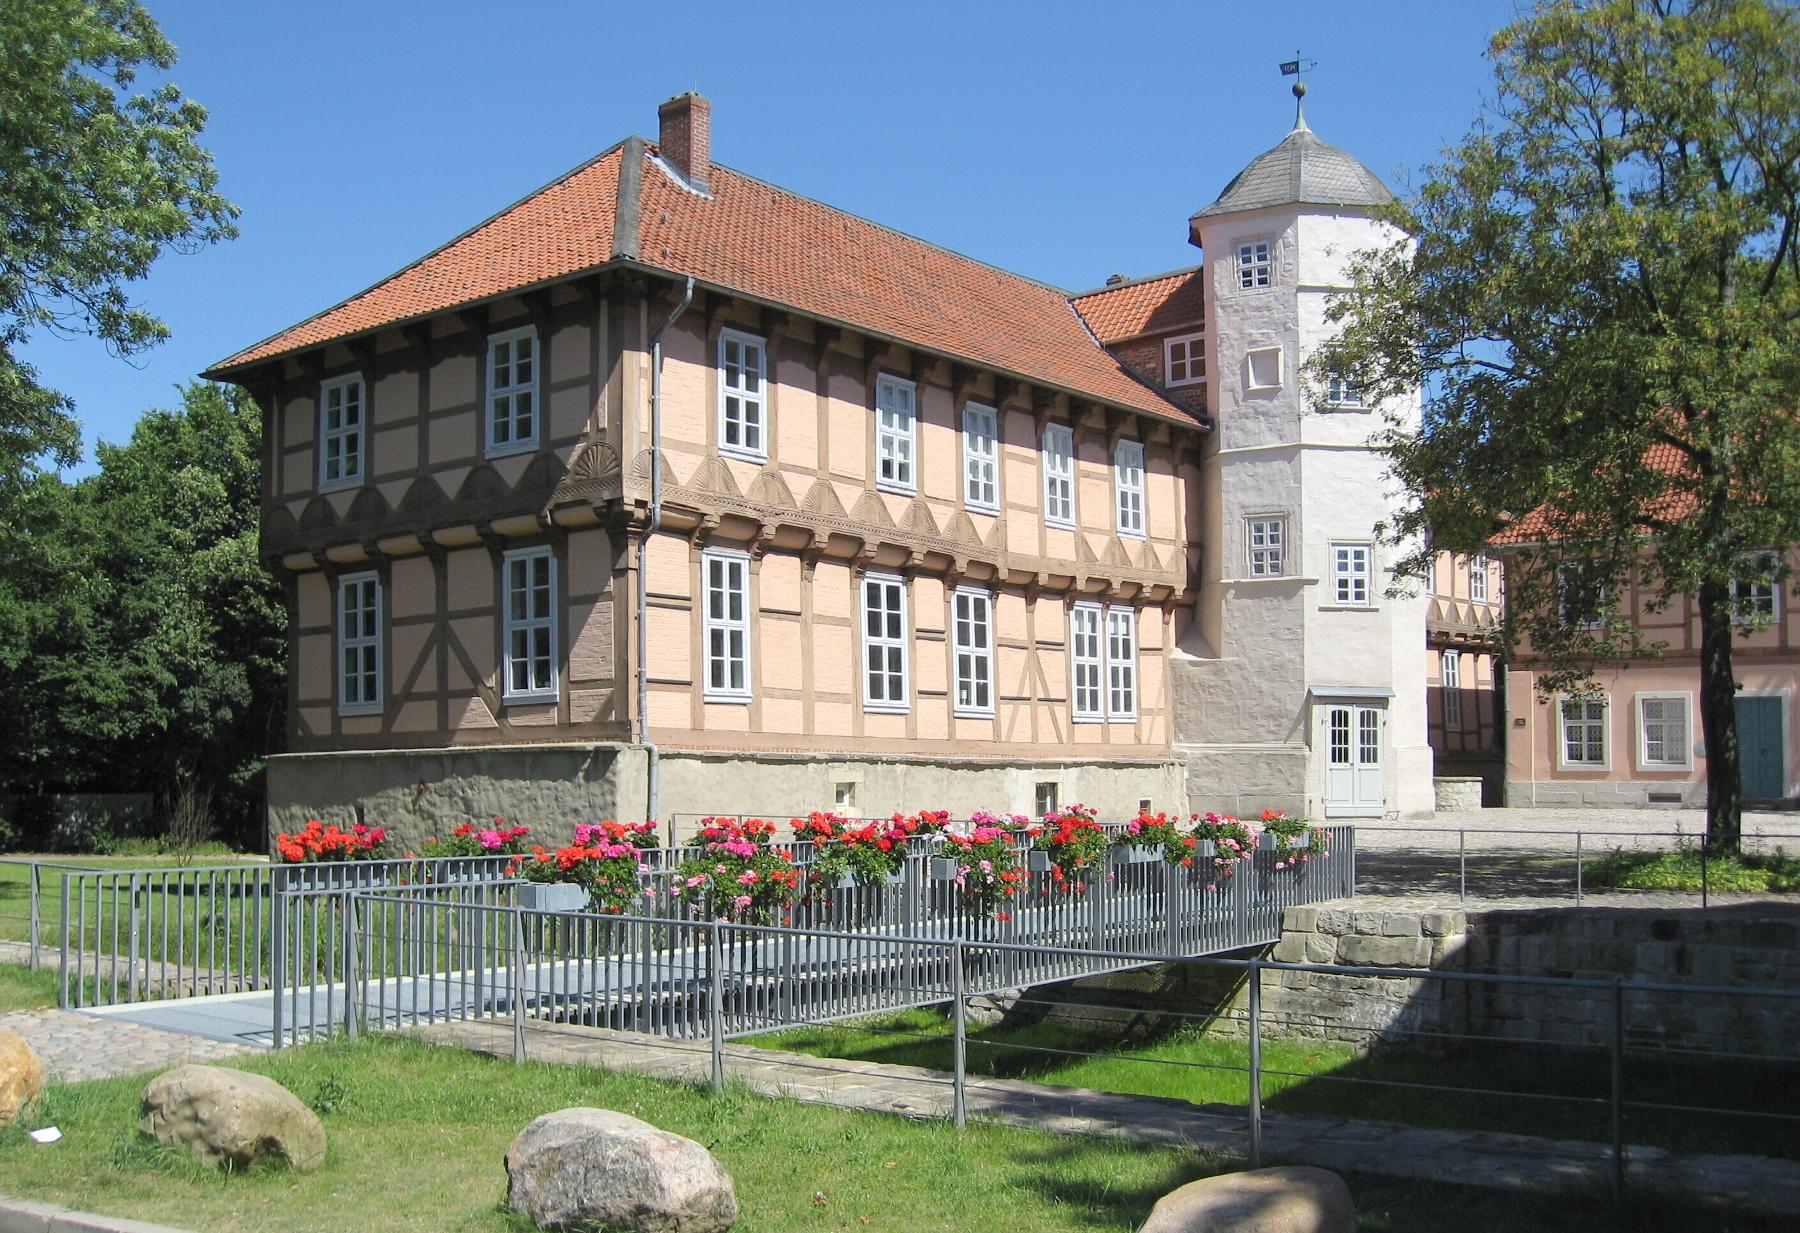 museumsreport hoffmann von fallersleben museum wiederer ffnet. Black Bedroom Furniture Sets. Home Design Ideas